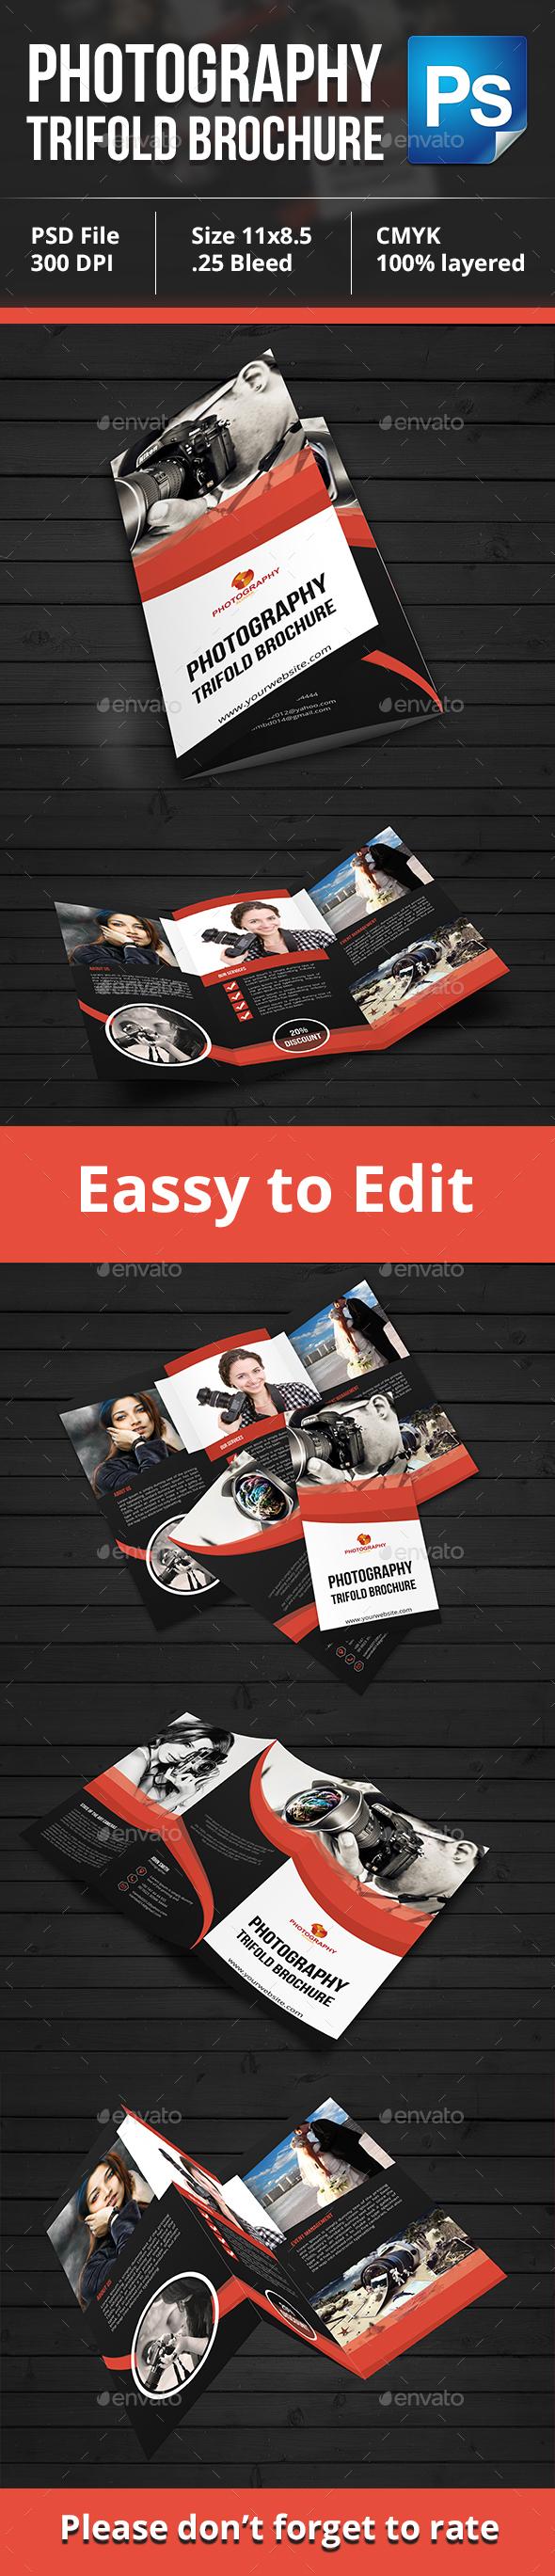 Photography Tri-Fold Brochure - Brochures Print